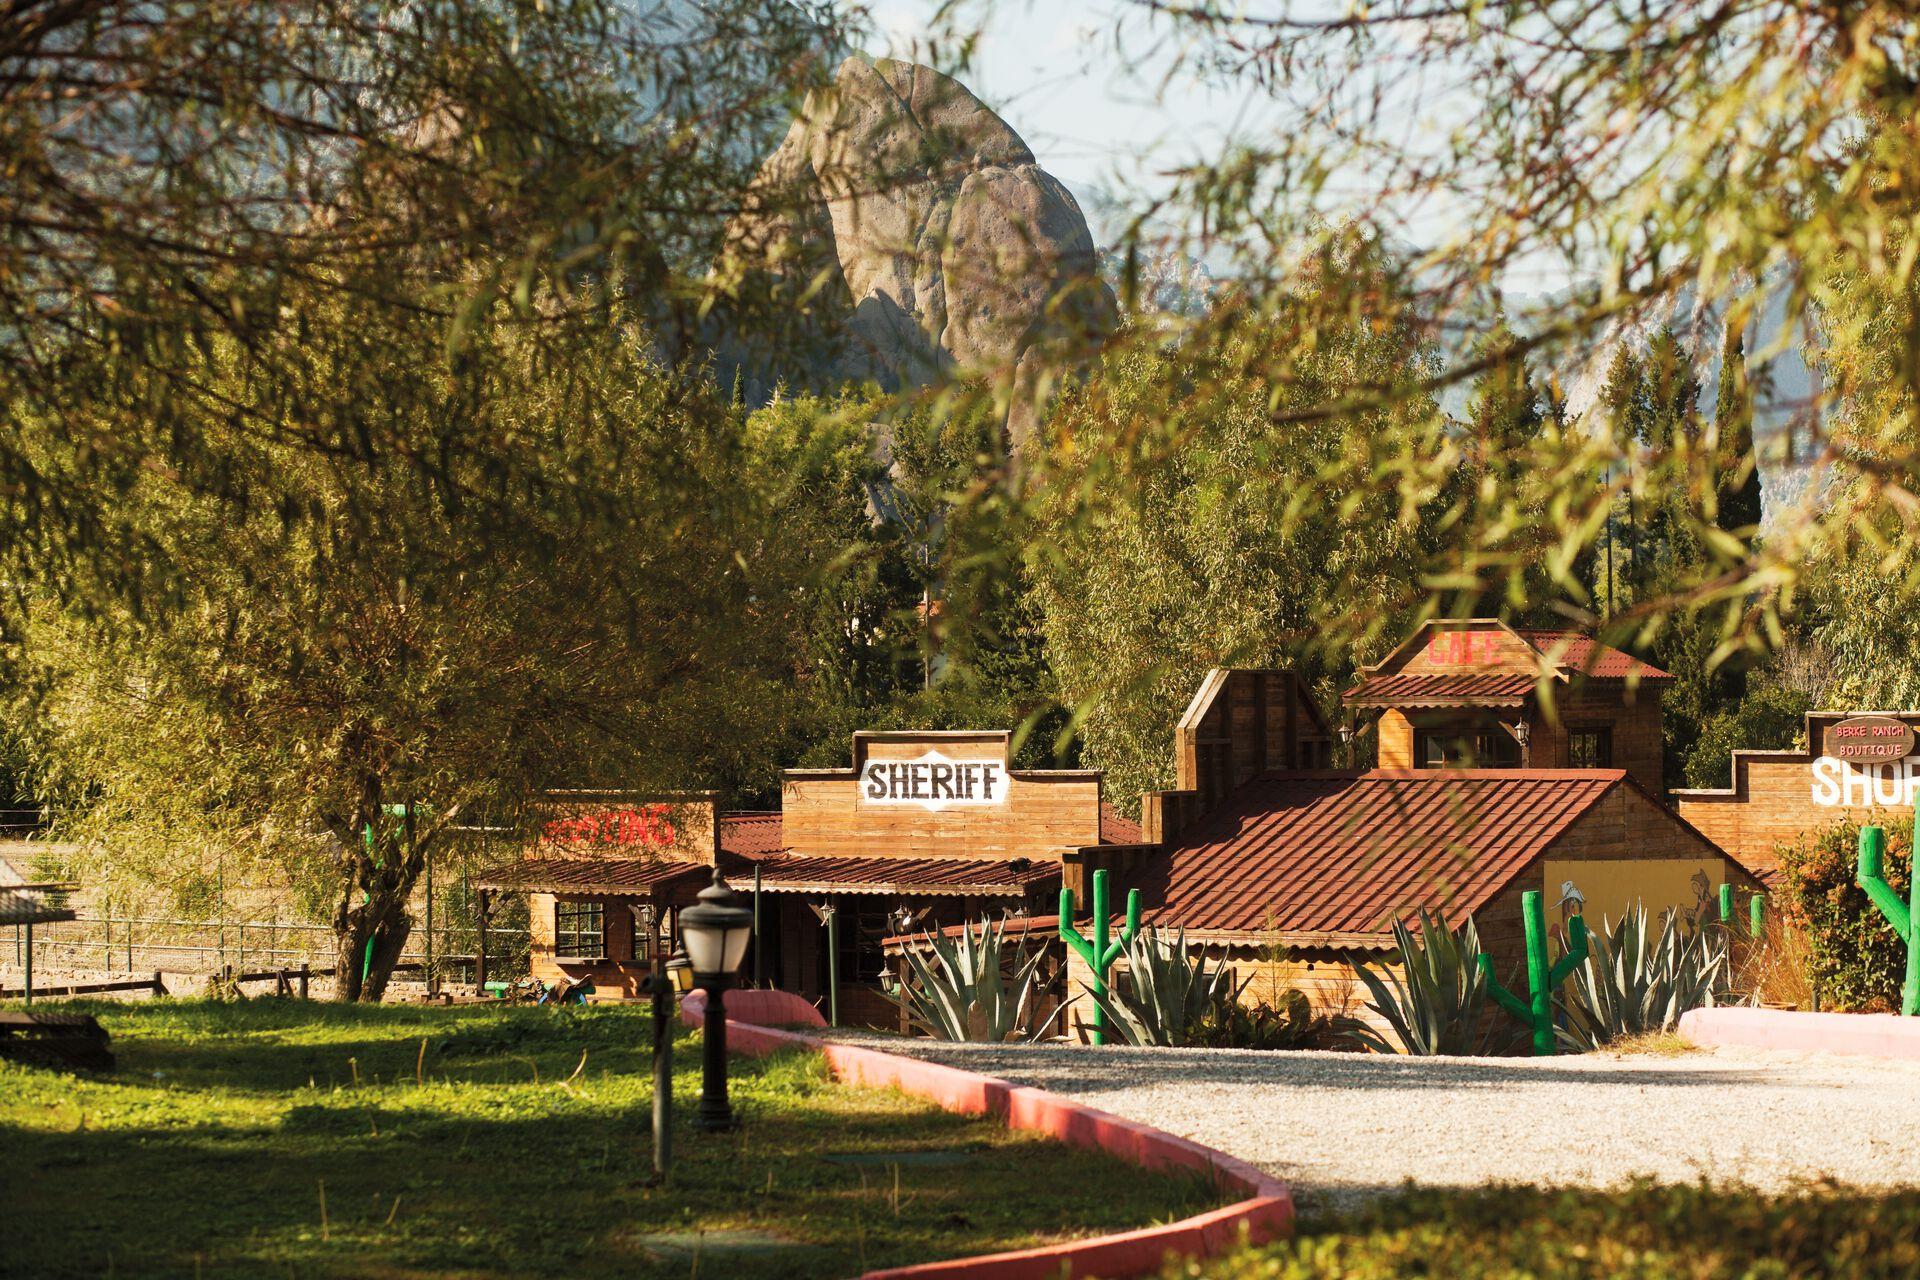 hotel berke ranch & nature - 0*